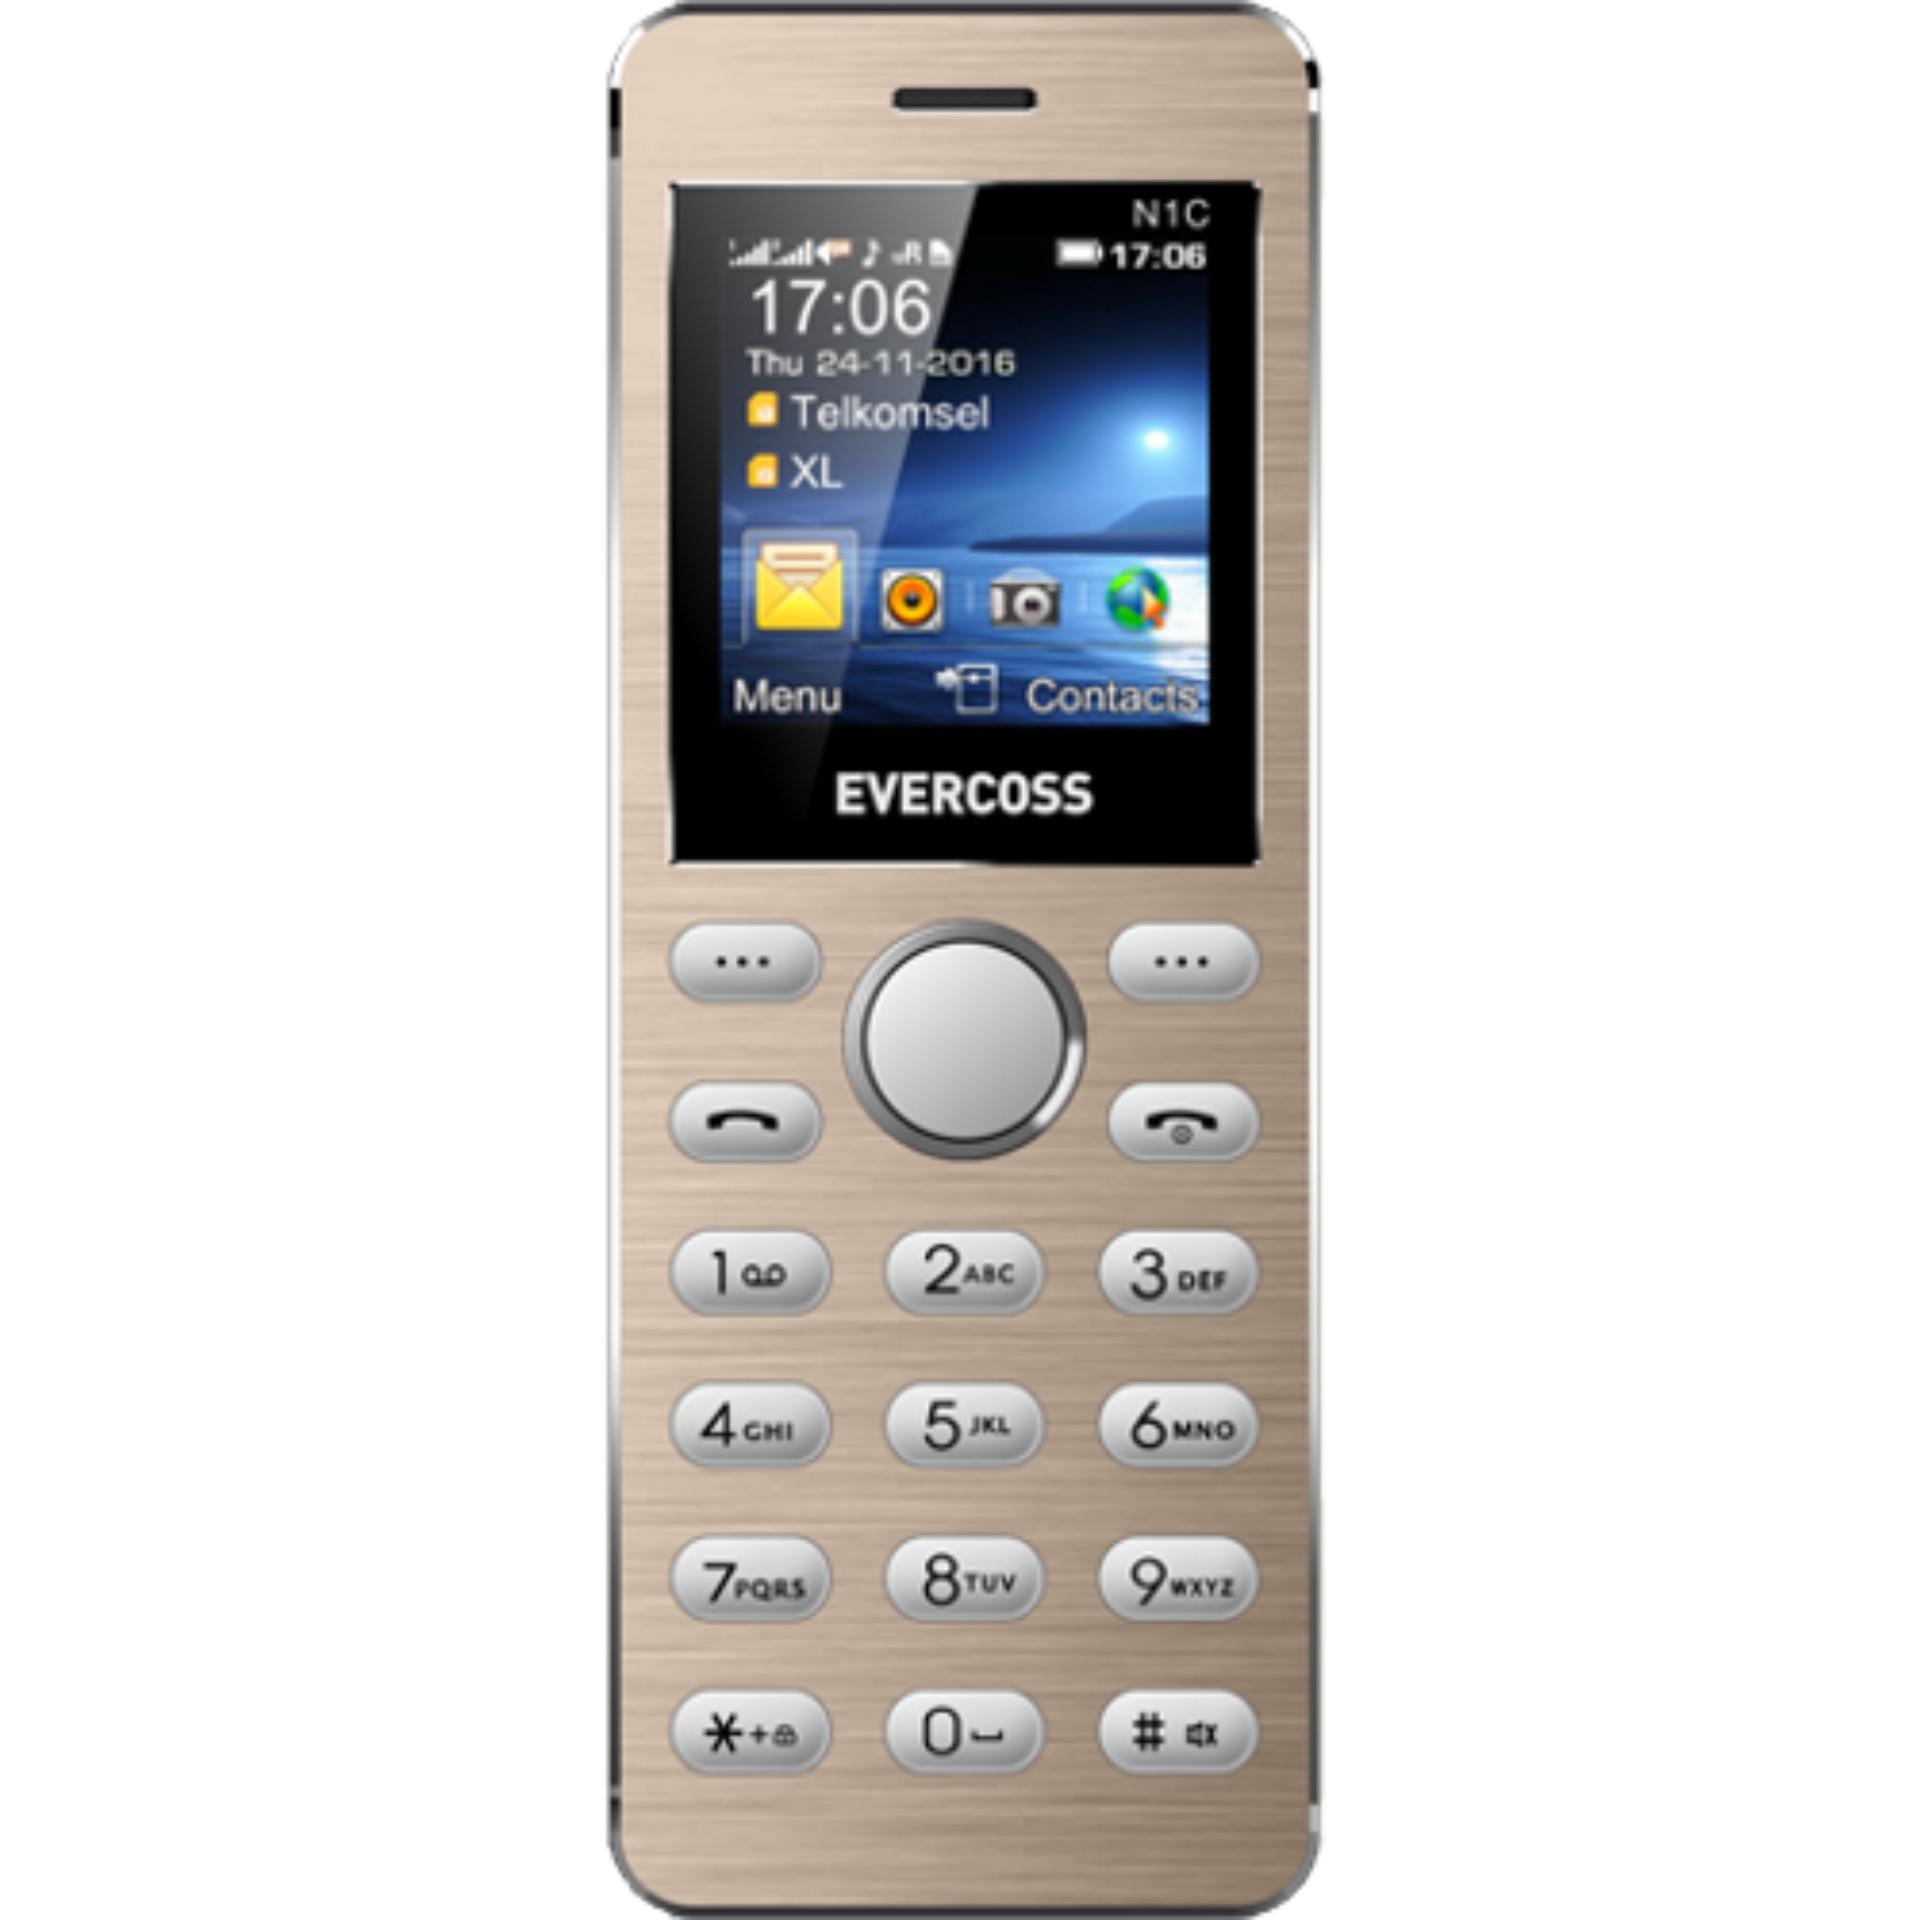 Handphone Evercoss Terlaris Murah Winner Y3 B75a 8gb Gold N1c Dual Sim Mini Phone